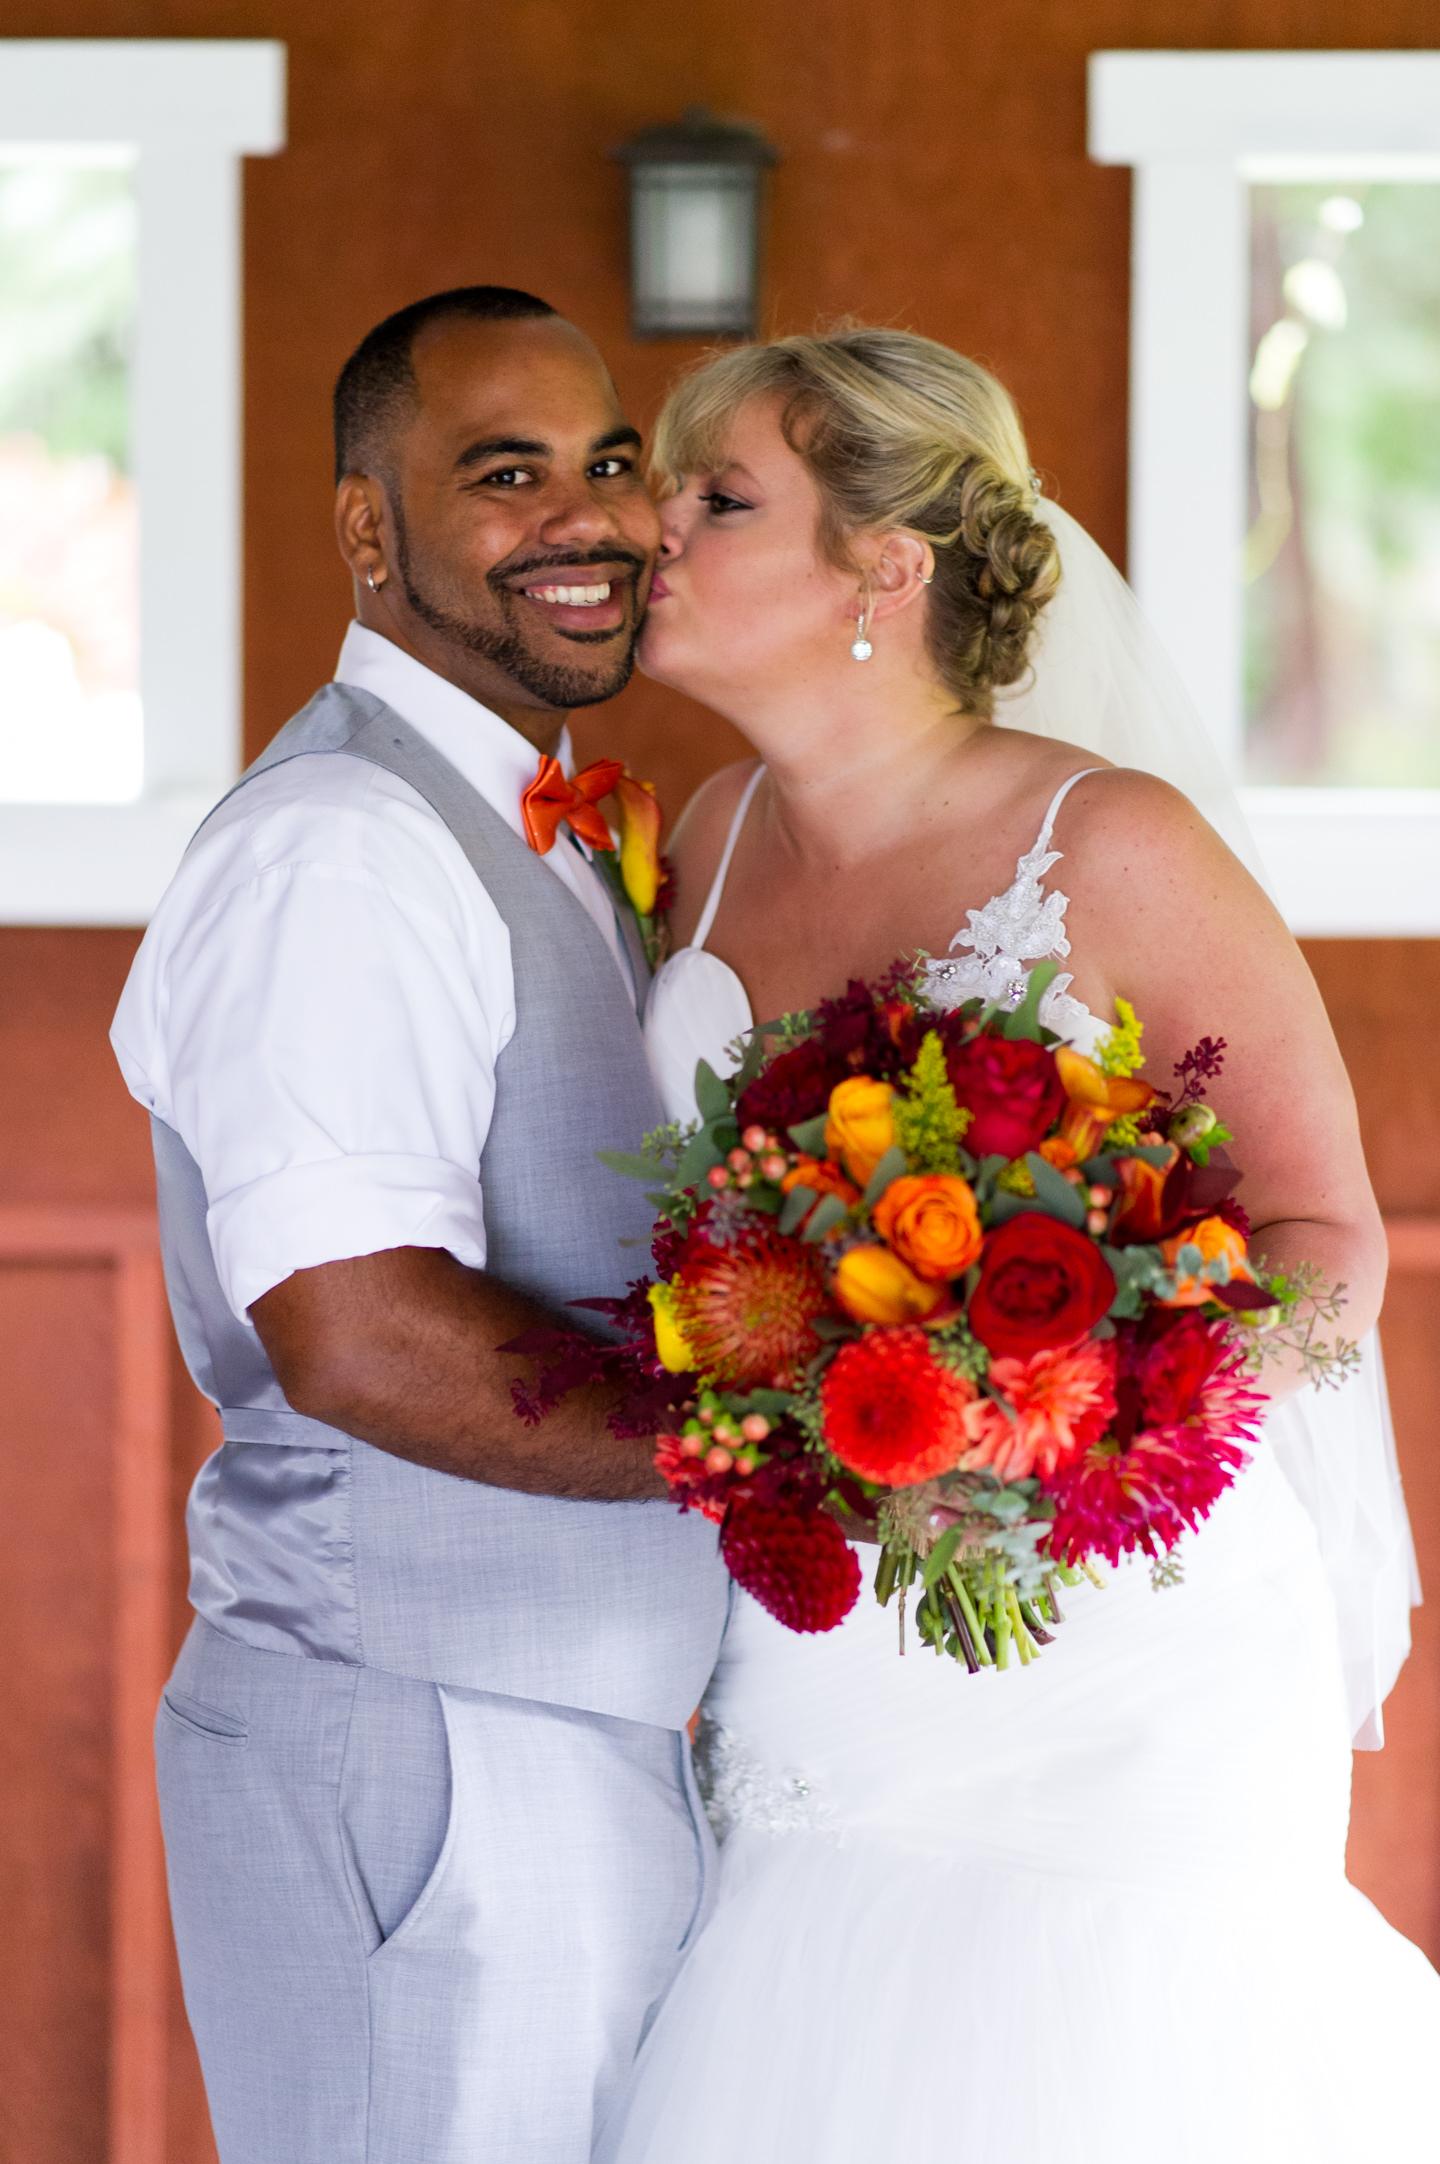 20160917_Tat_Renee and Marcus Wedding-24.jpg